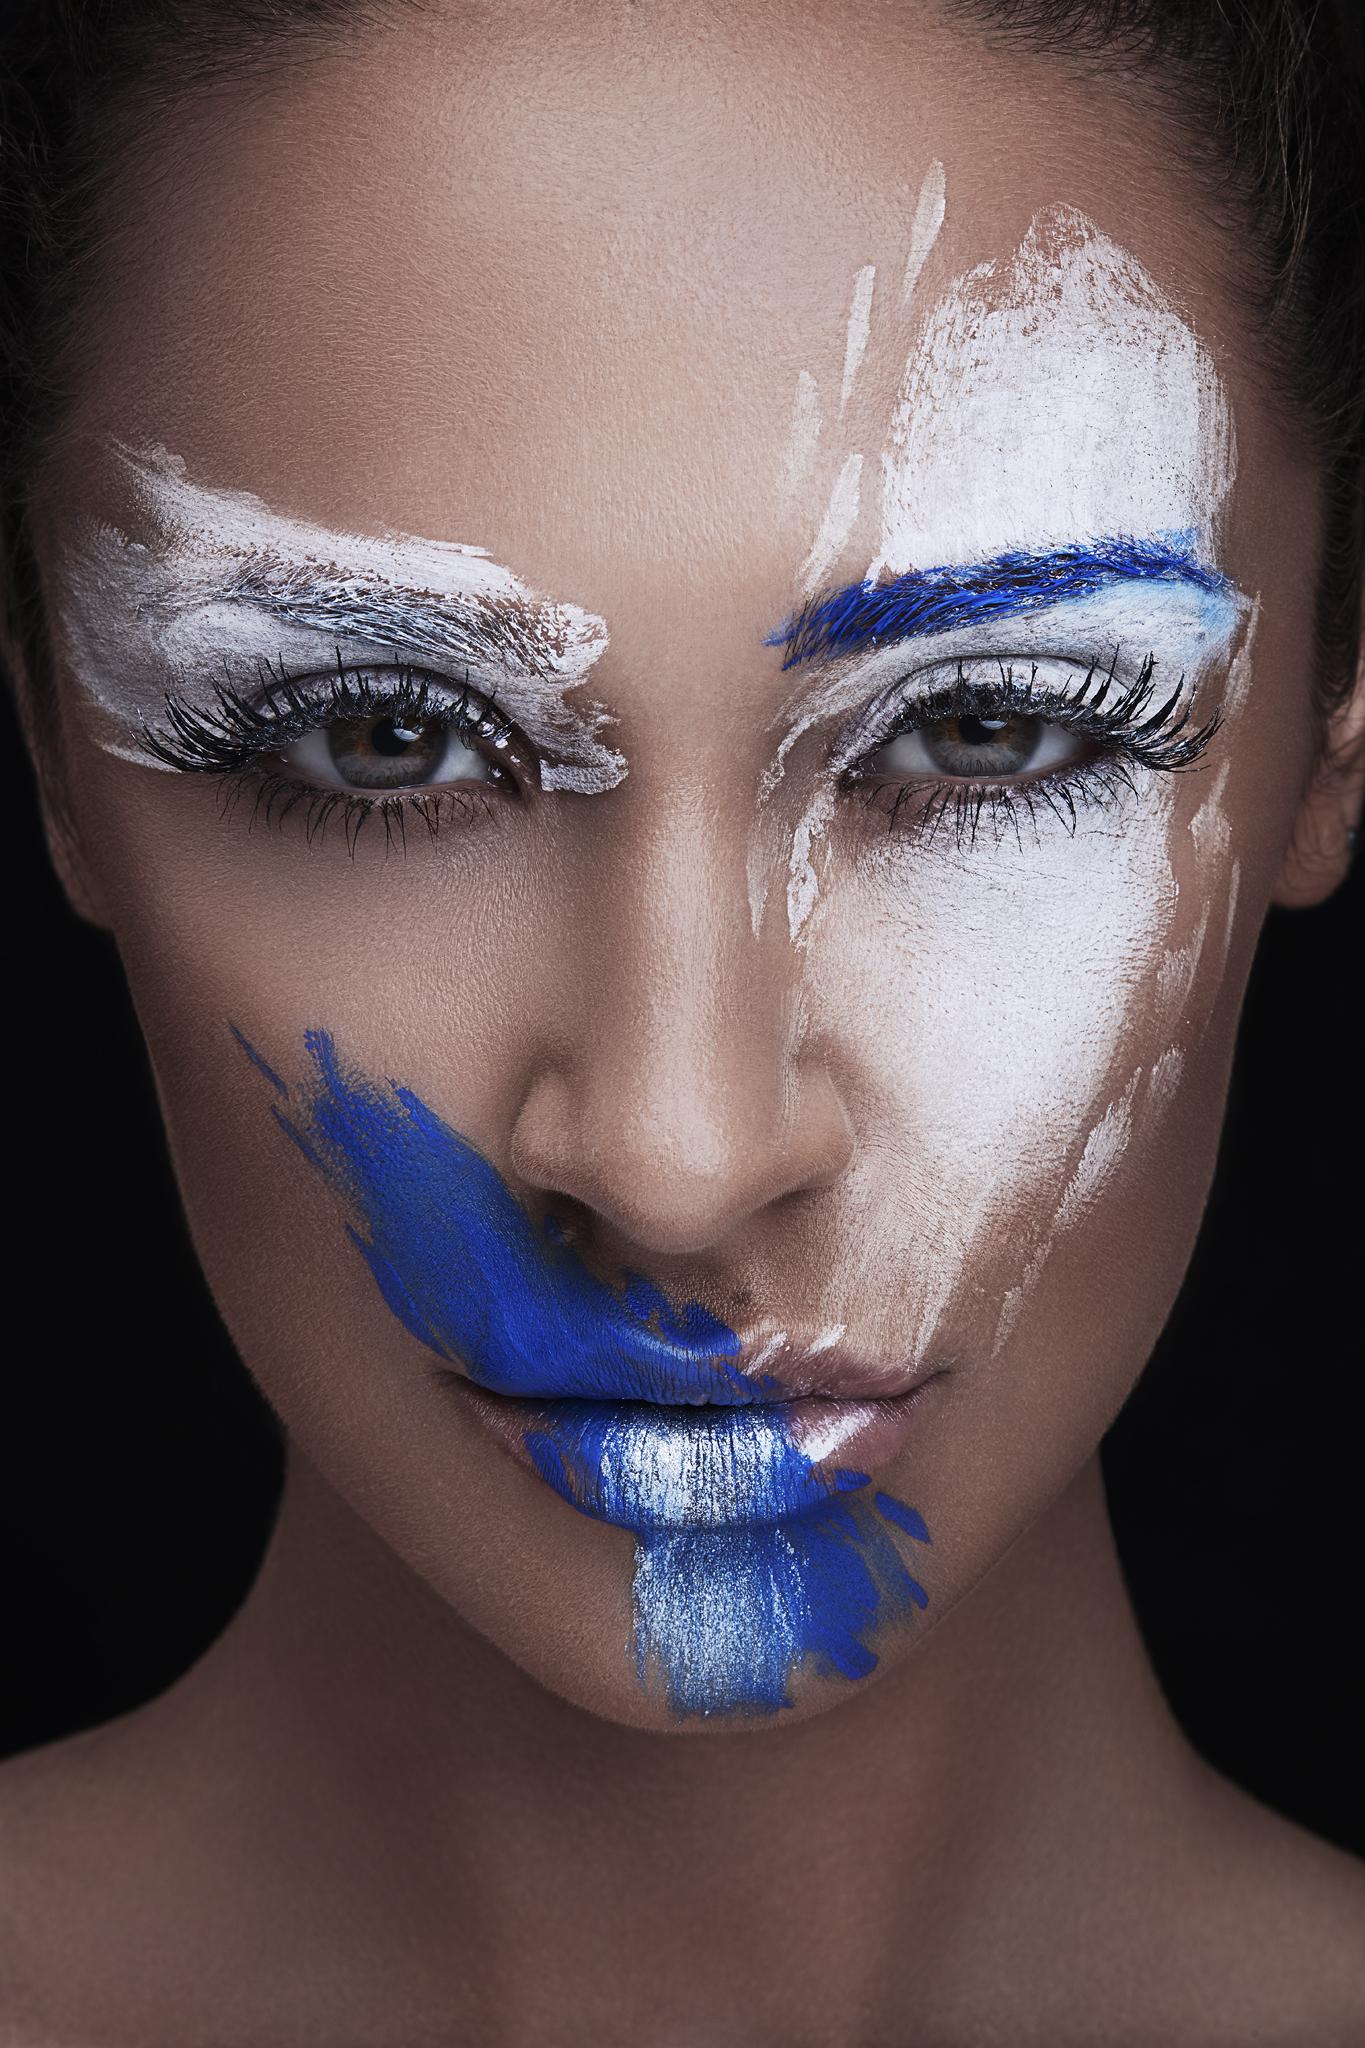 2012 12 11 Vicky Lina Ferda6683 2048px - Videotutorial: Beautyretusche DODGE & BURN